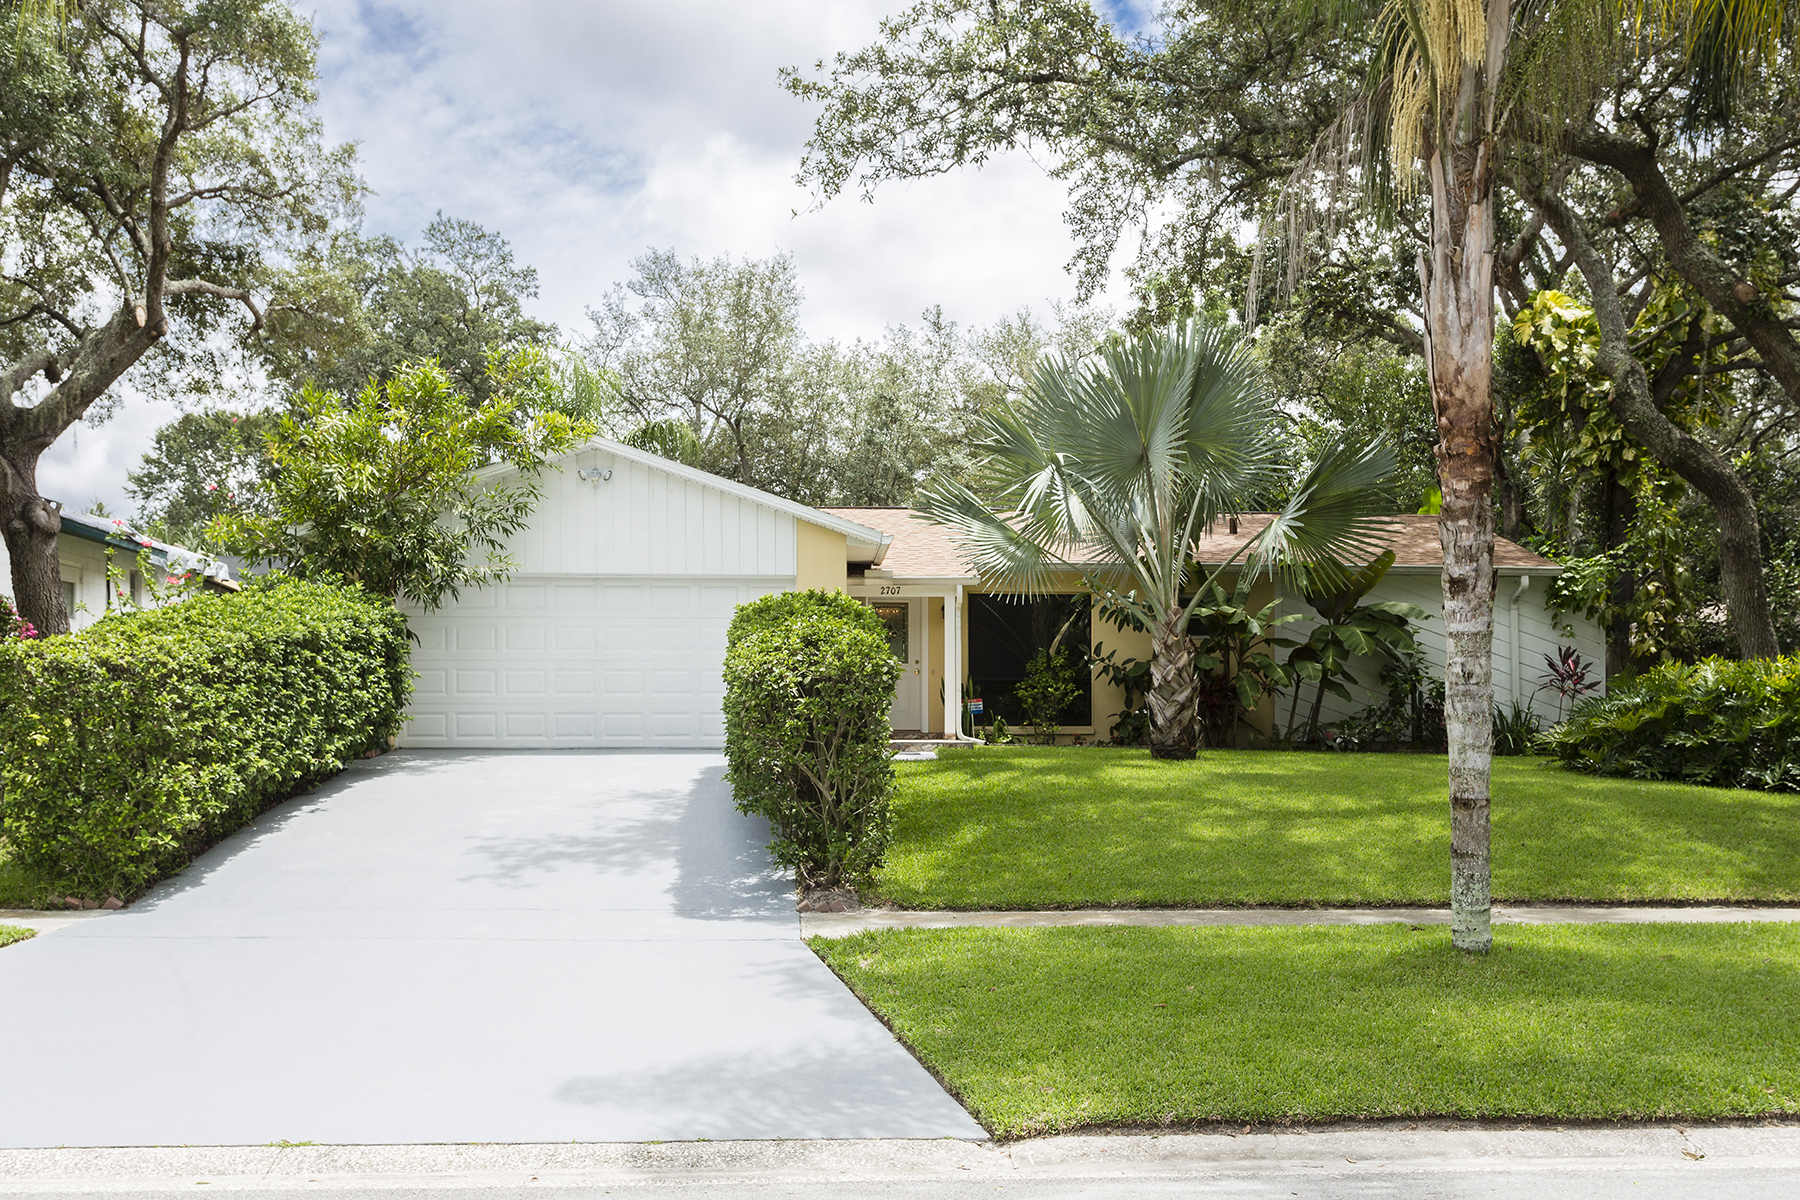 Single Family Home for Sale at ORLANDO - FLORIDA 2707 Kinnon Dr Orlando, Florida, 32817 United States